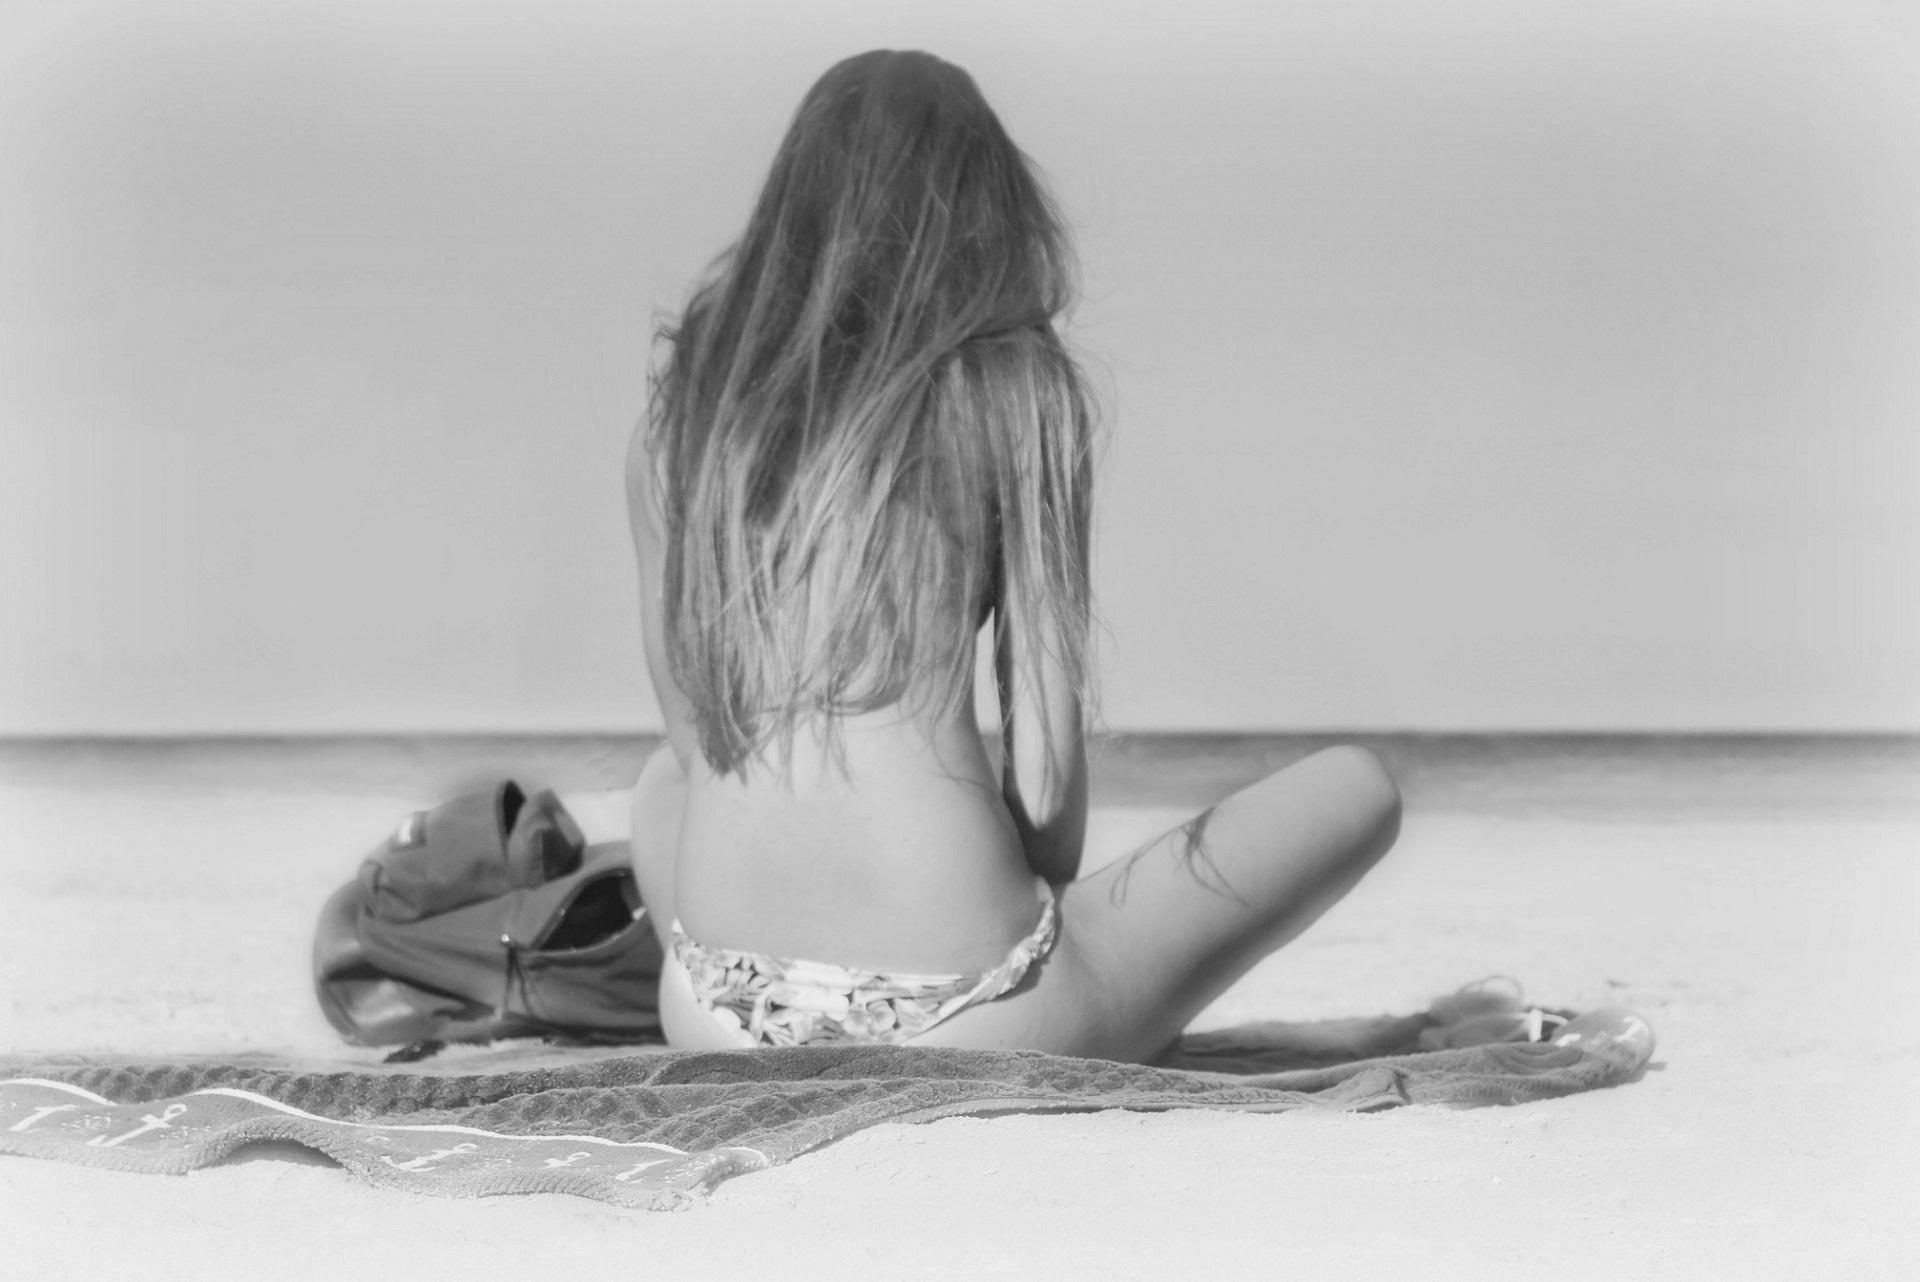 drawings-of-women-in-erotic-positions-hardcore